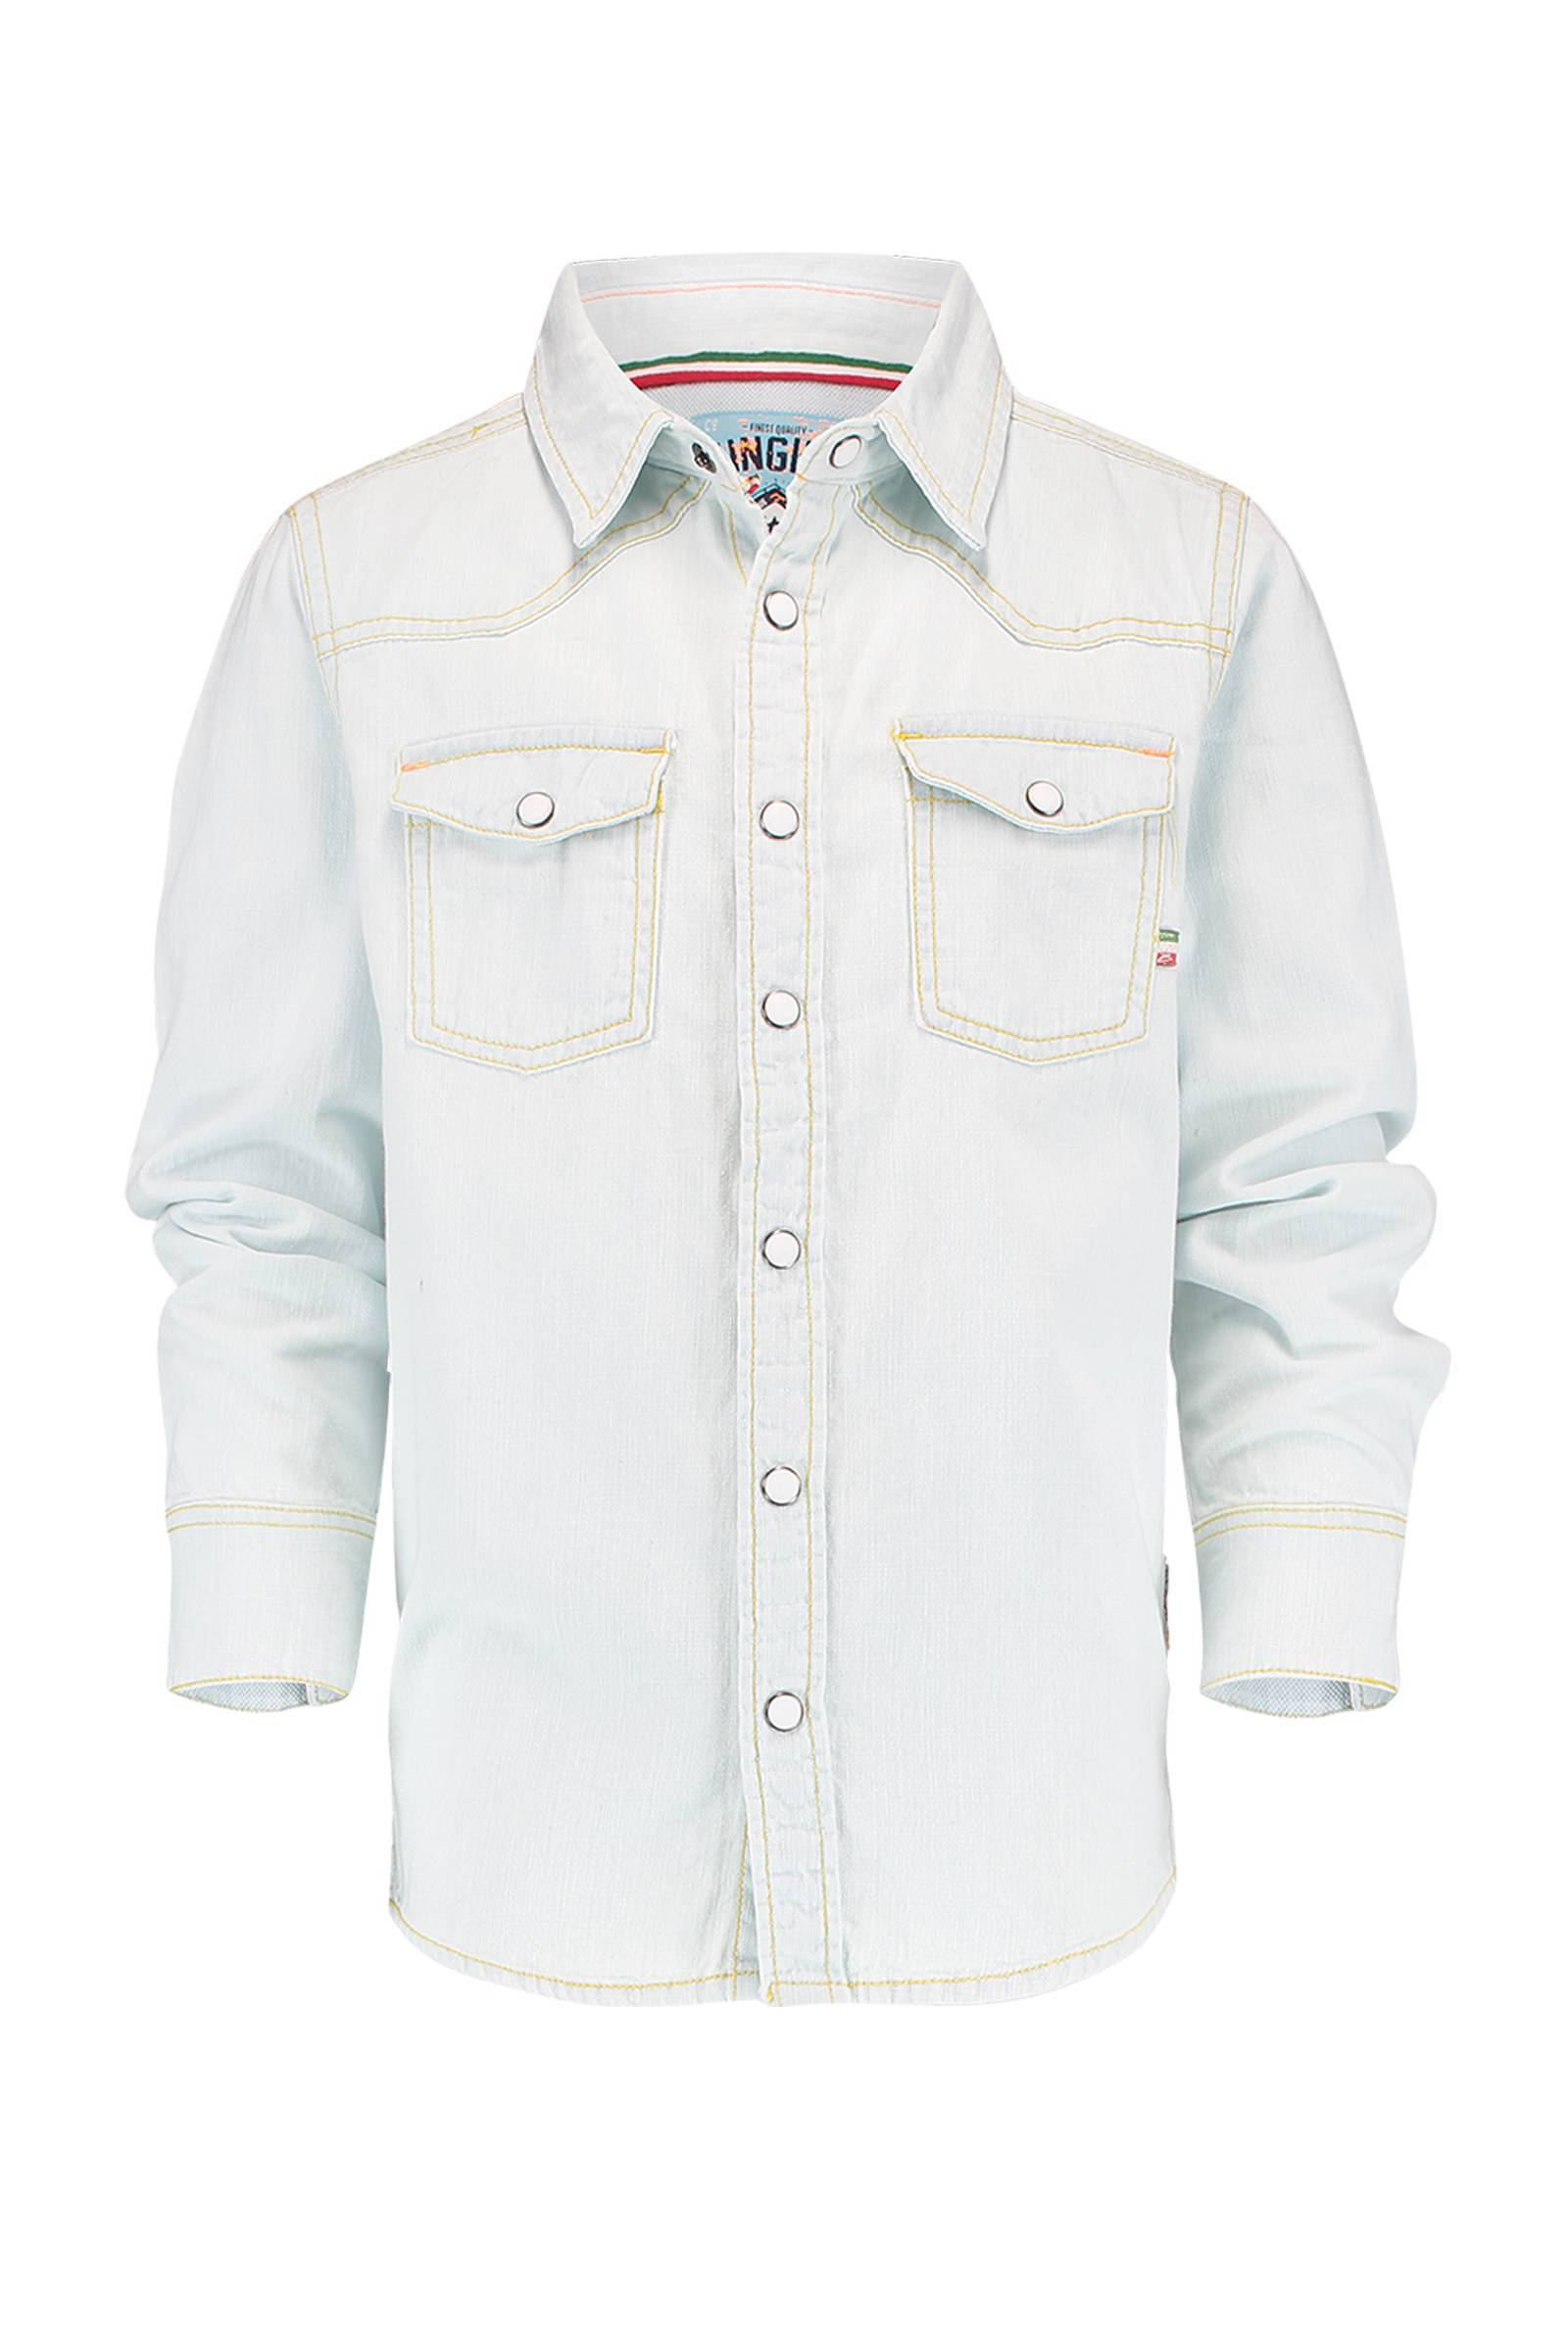 Vingino denim overhemd | wehkamp